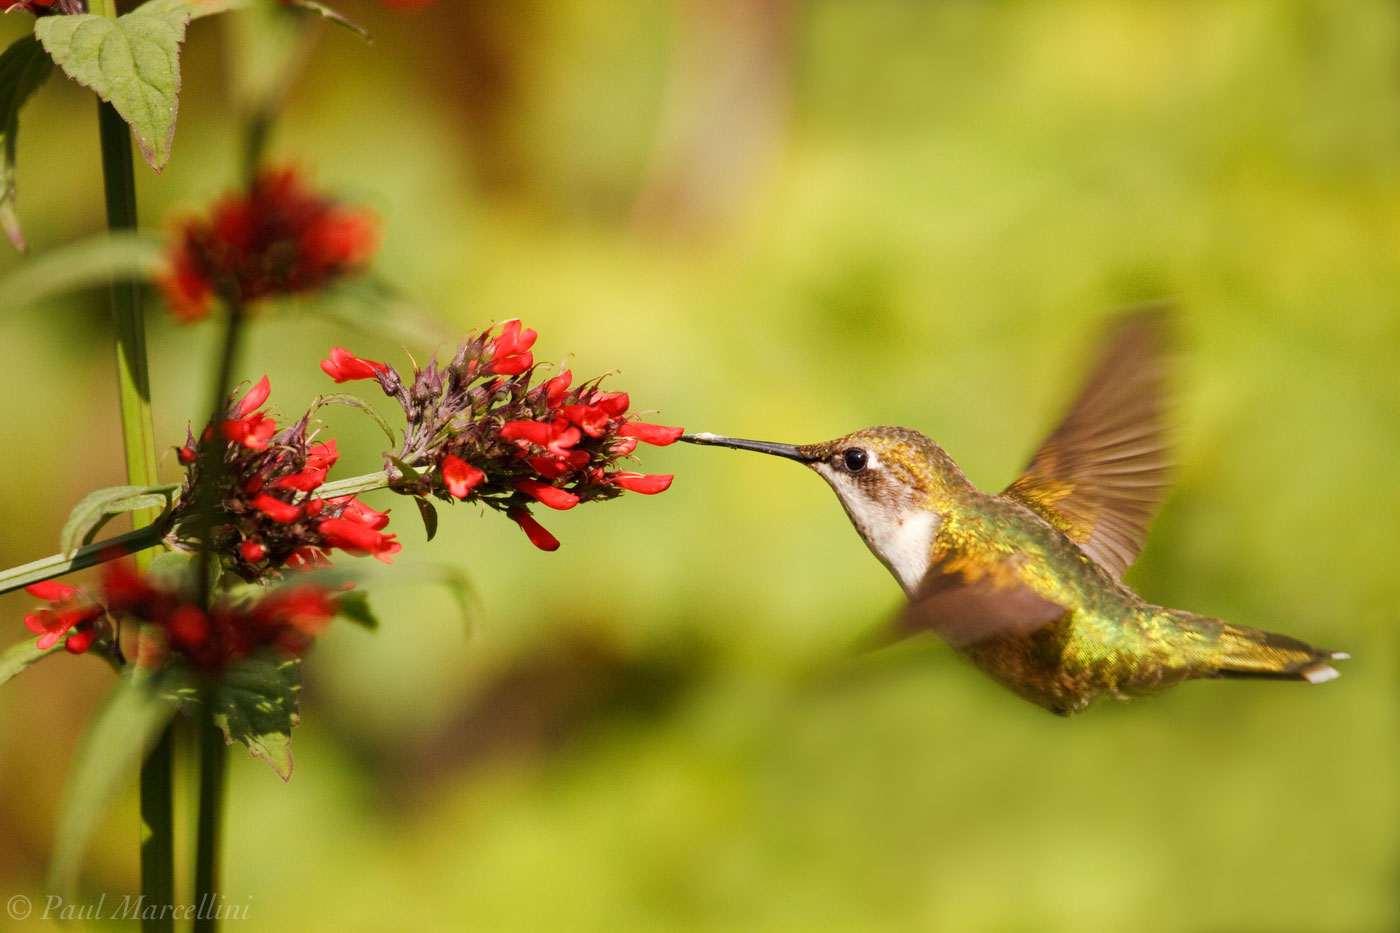 Ruby-throated Hummingbird, Archilochus colubris, photo